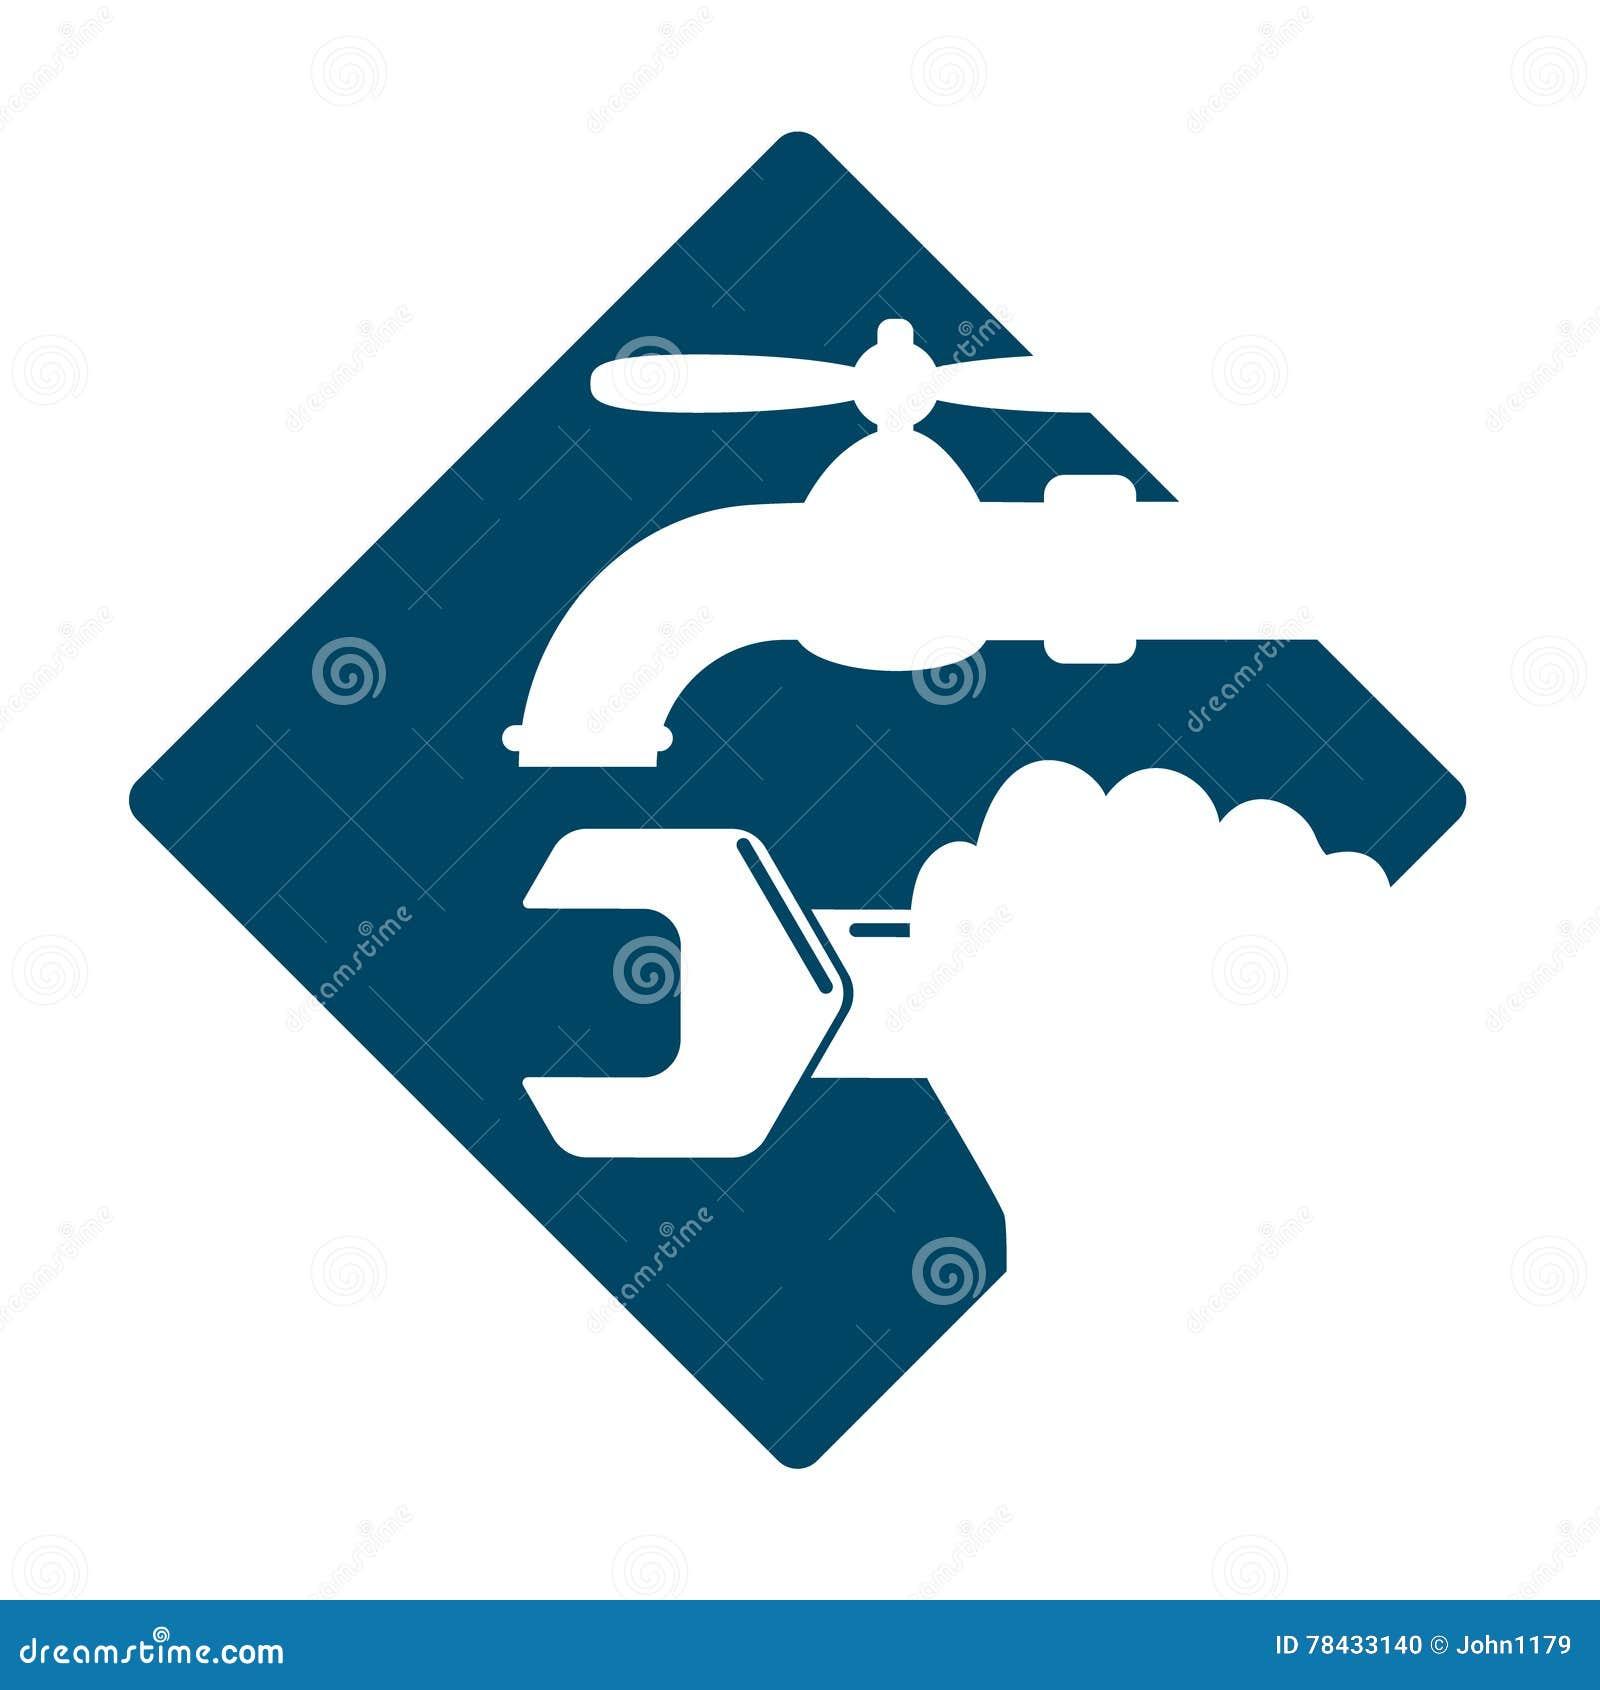 Plumbing Service Symbol Stock Vector Illustration Of Industrial